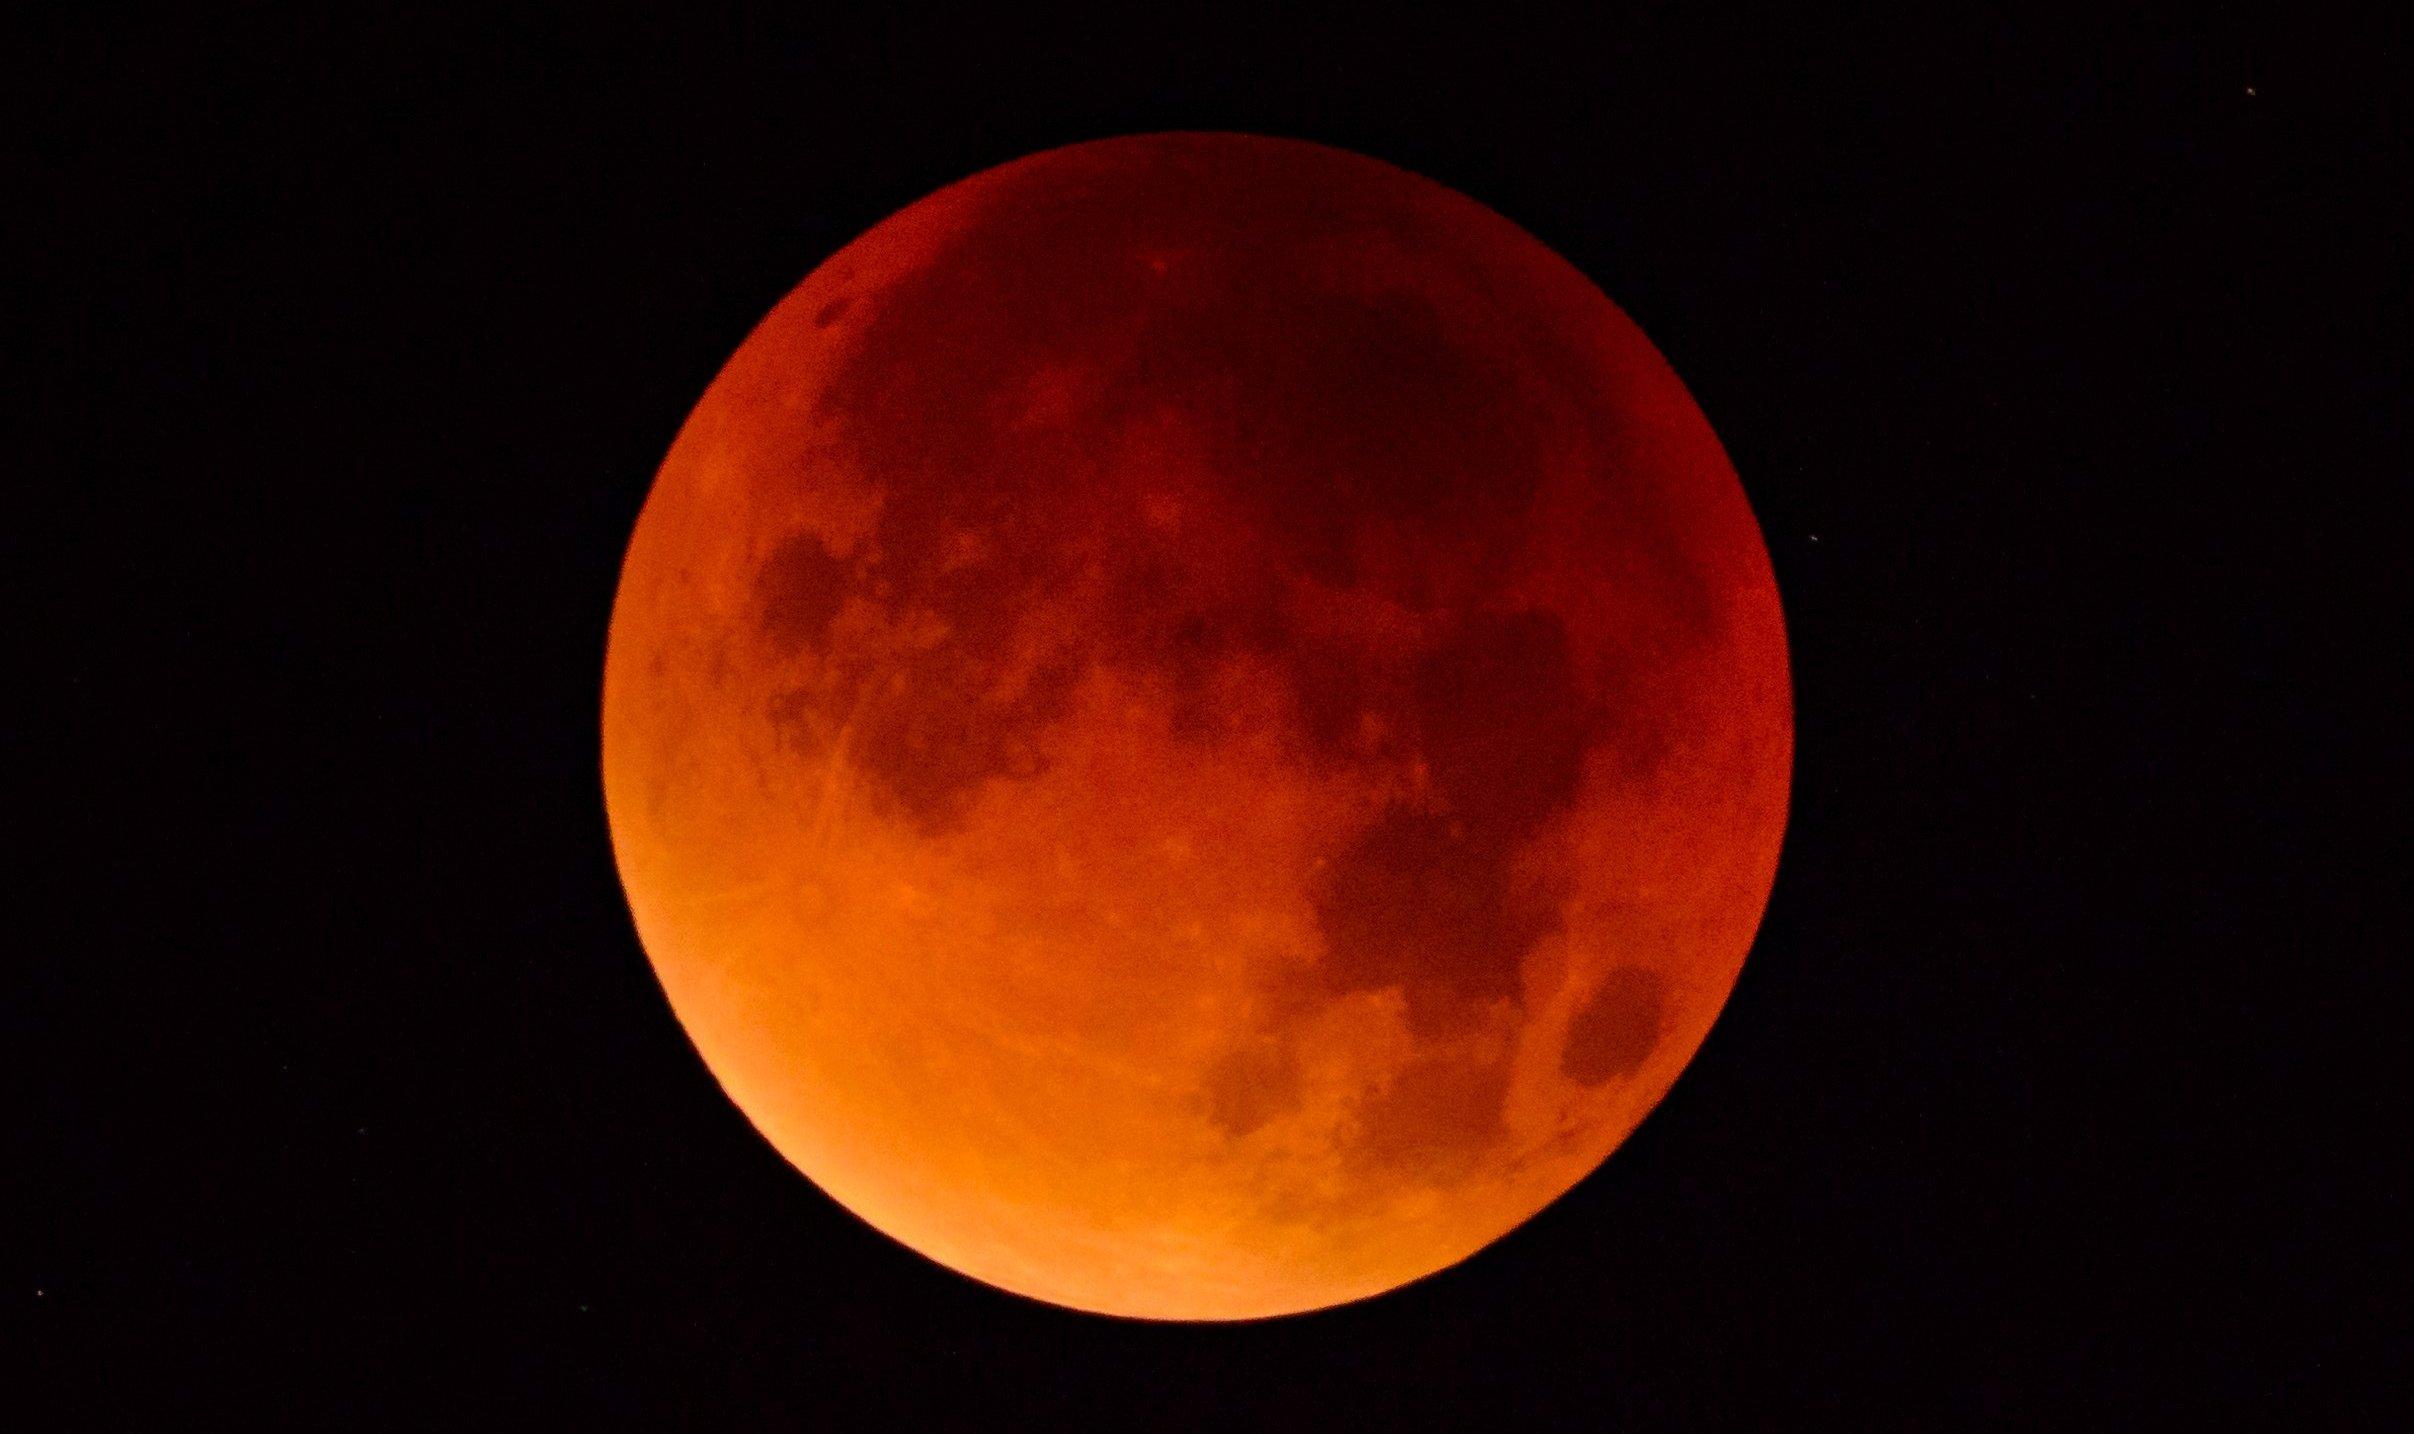 luna sangre eclipse